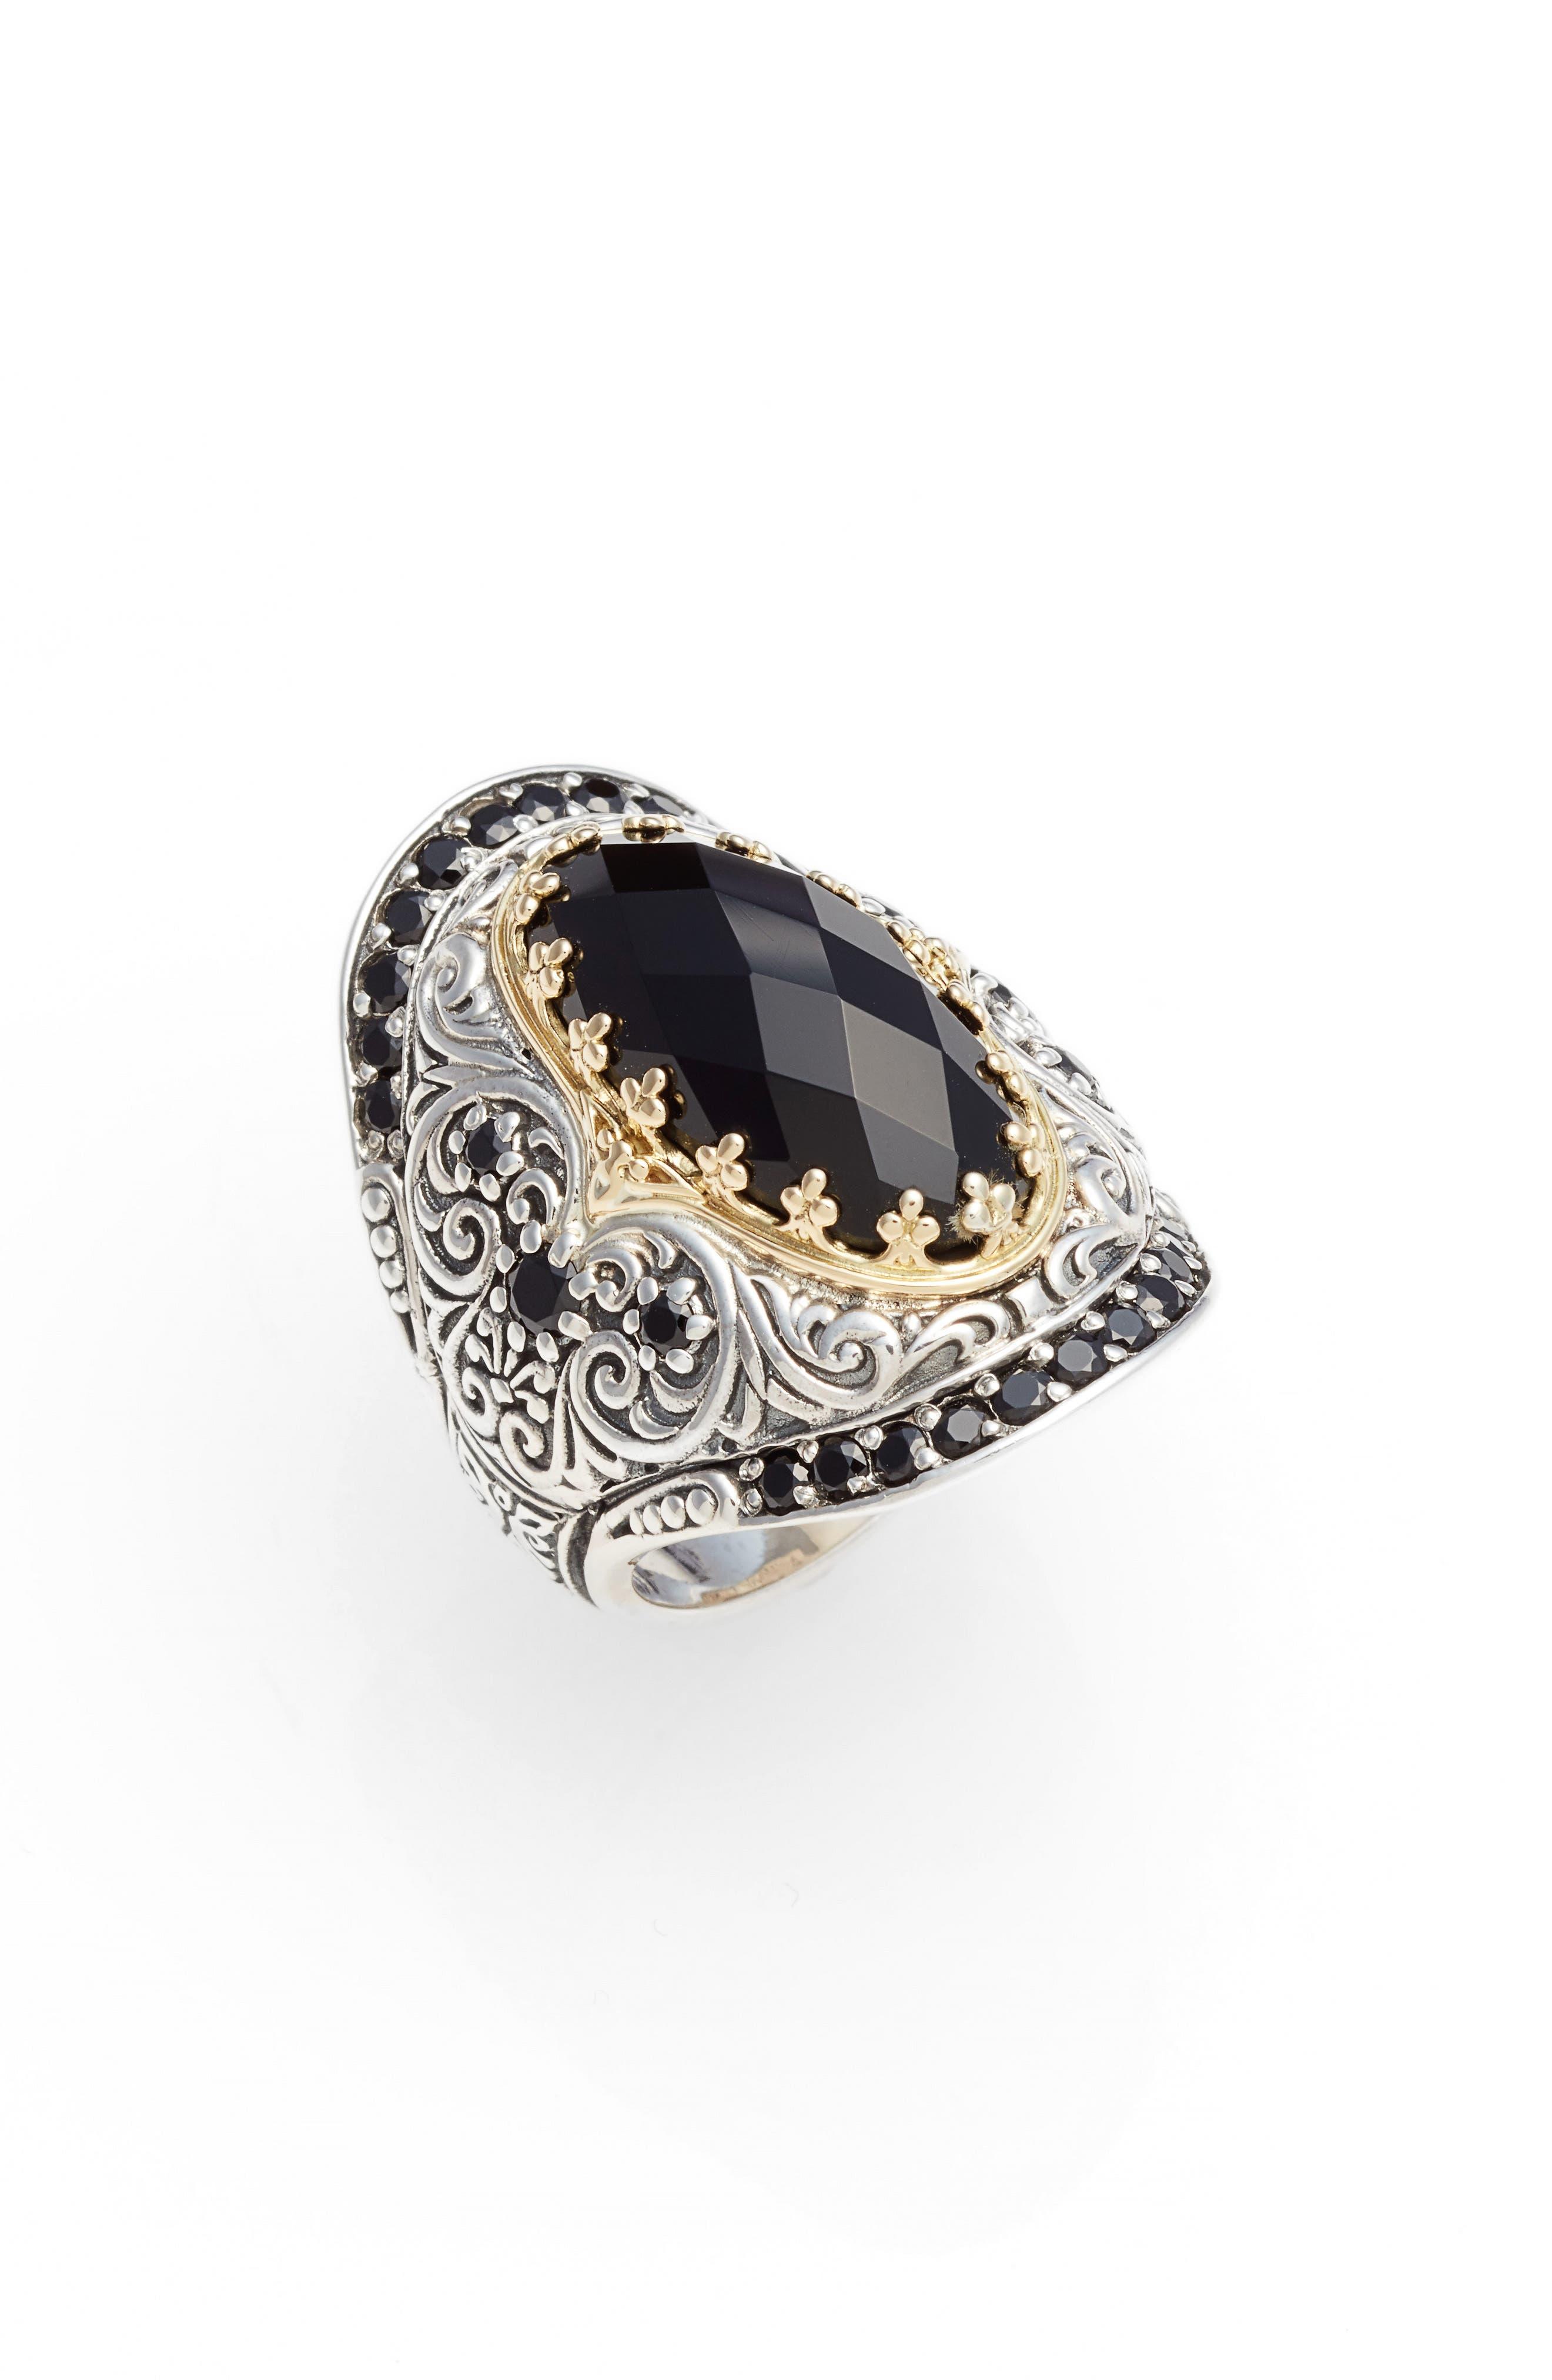 Selene Saddle Ring,                         Main,                         color, SILVER/ GOLD/ BLACK